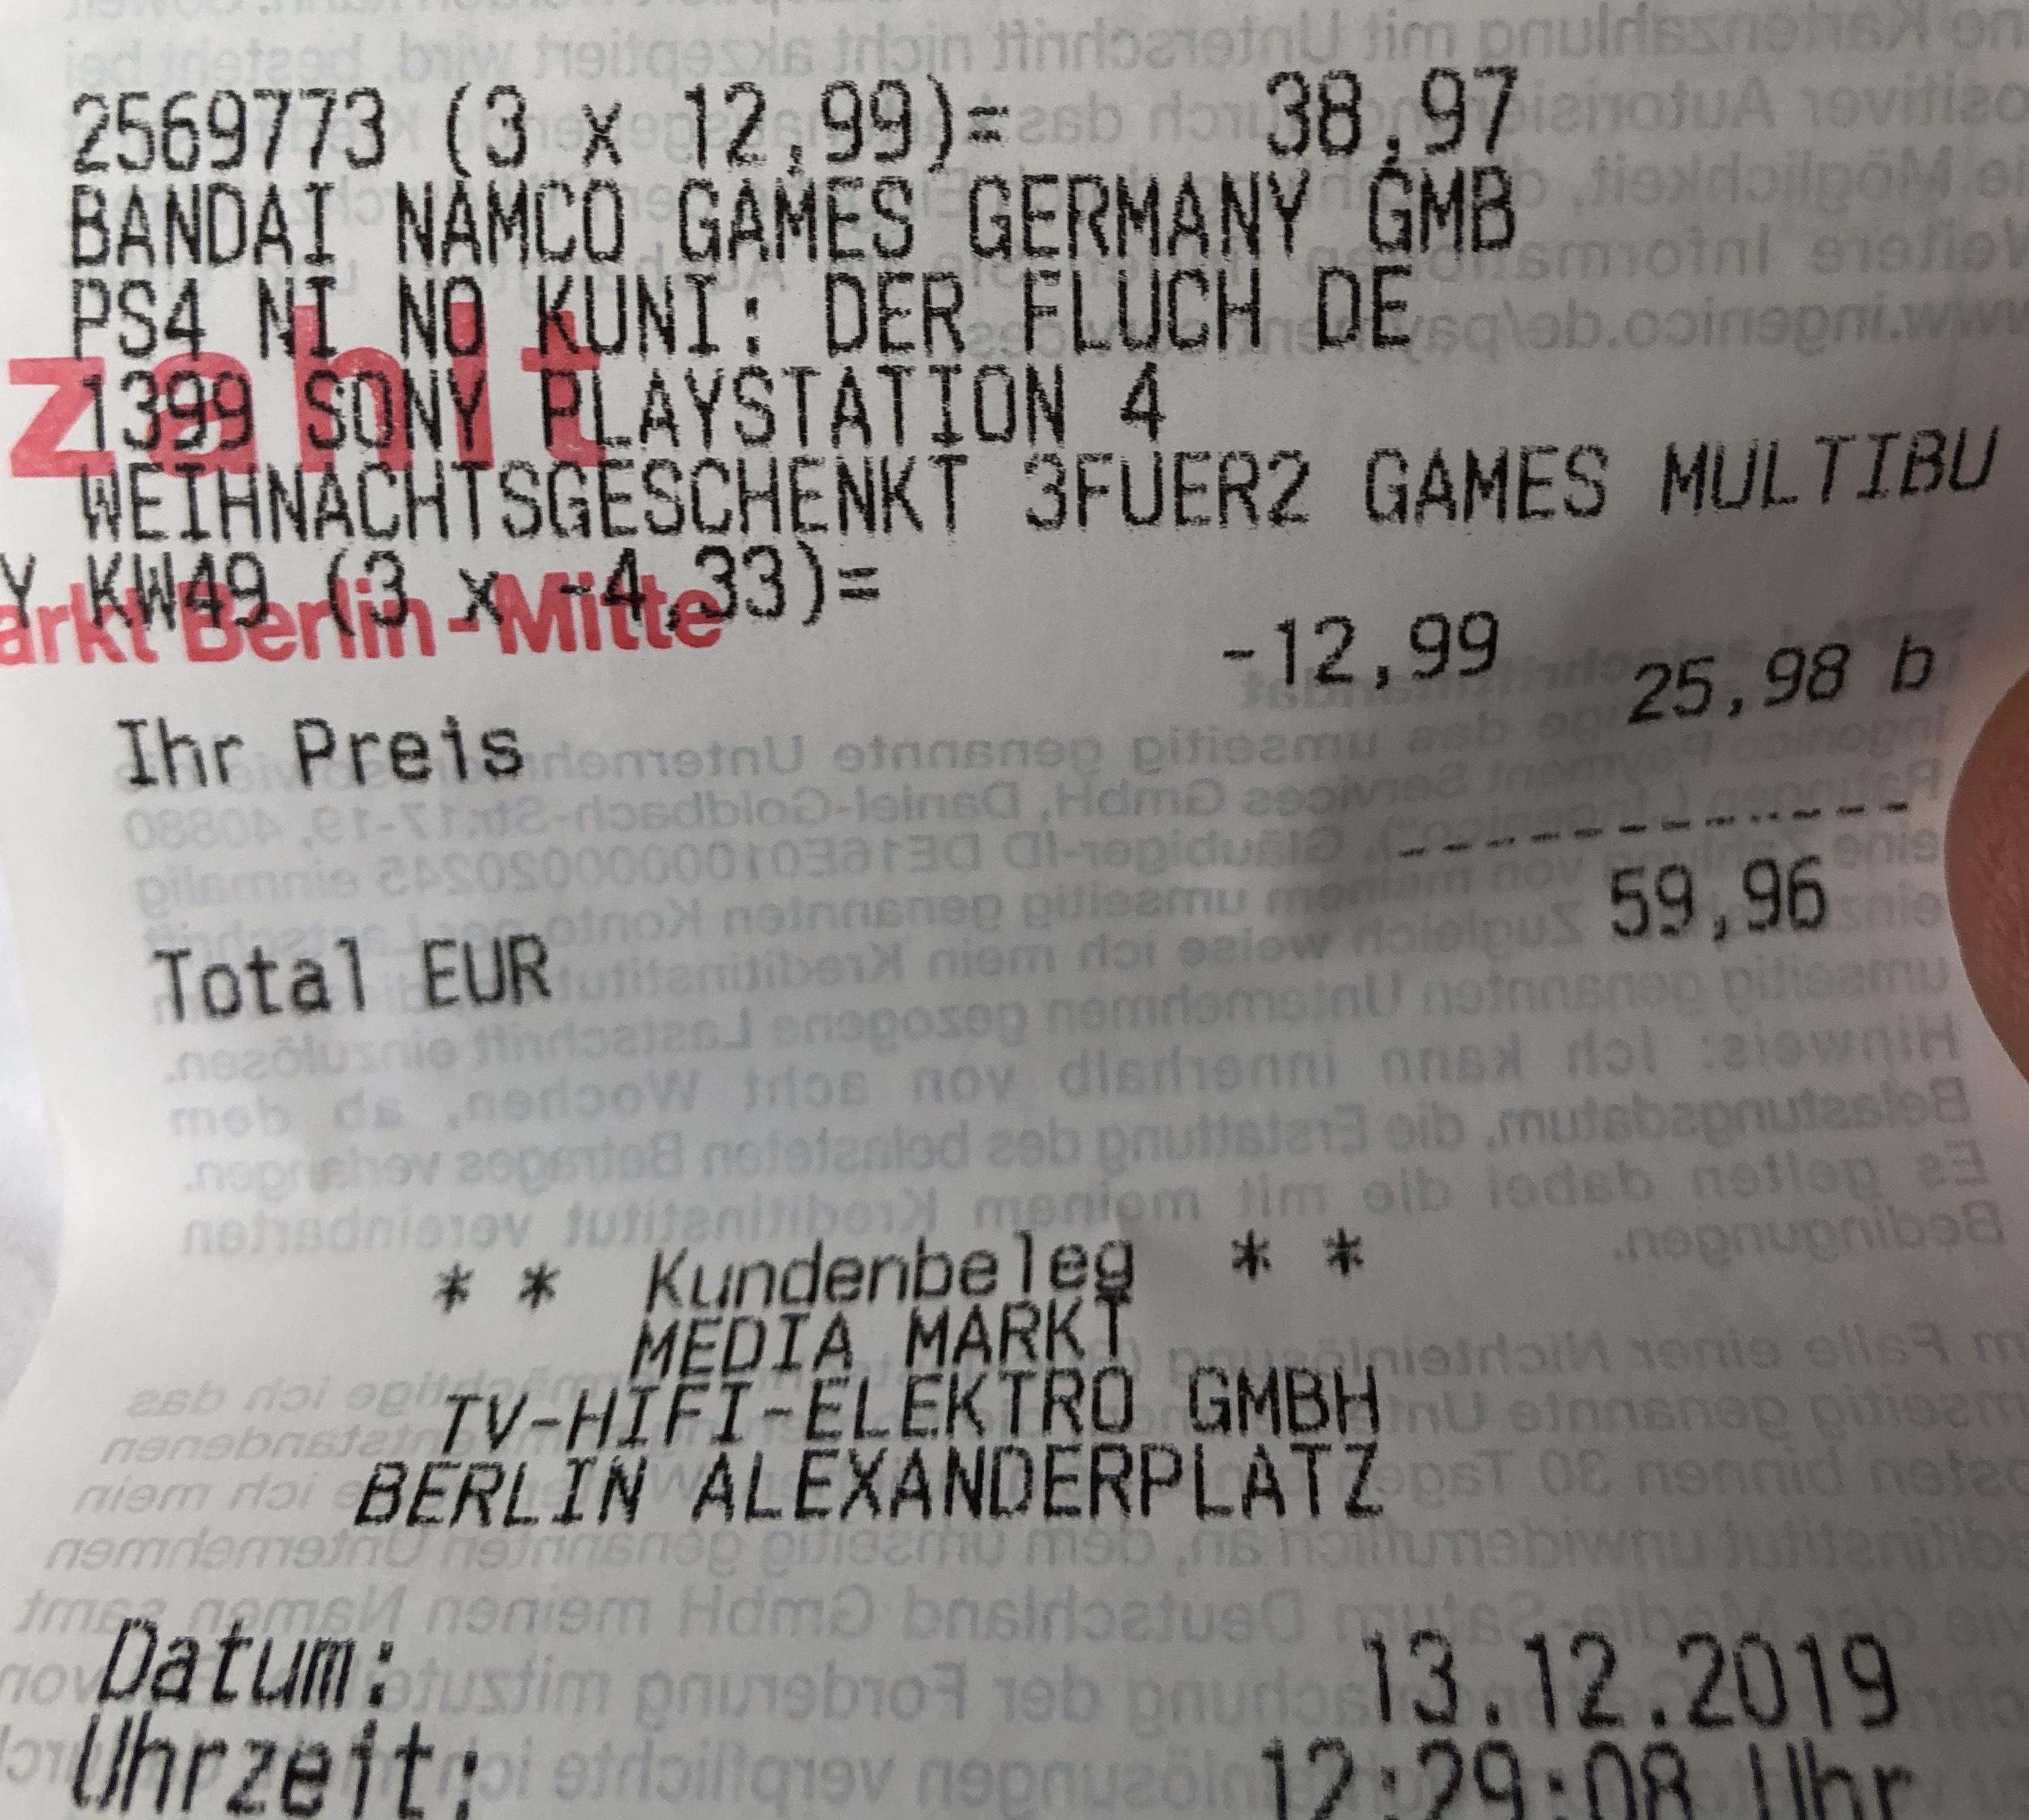 [Lokal?] Berlin Media-Markt Alexanderplatz Ni No Kuni 1 PS4 Fluch Der Weißen Königin Remastered